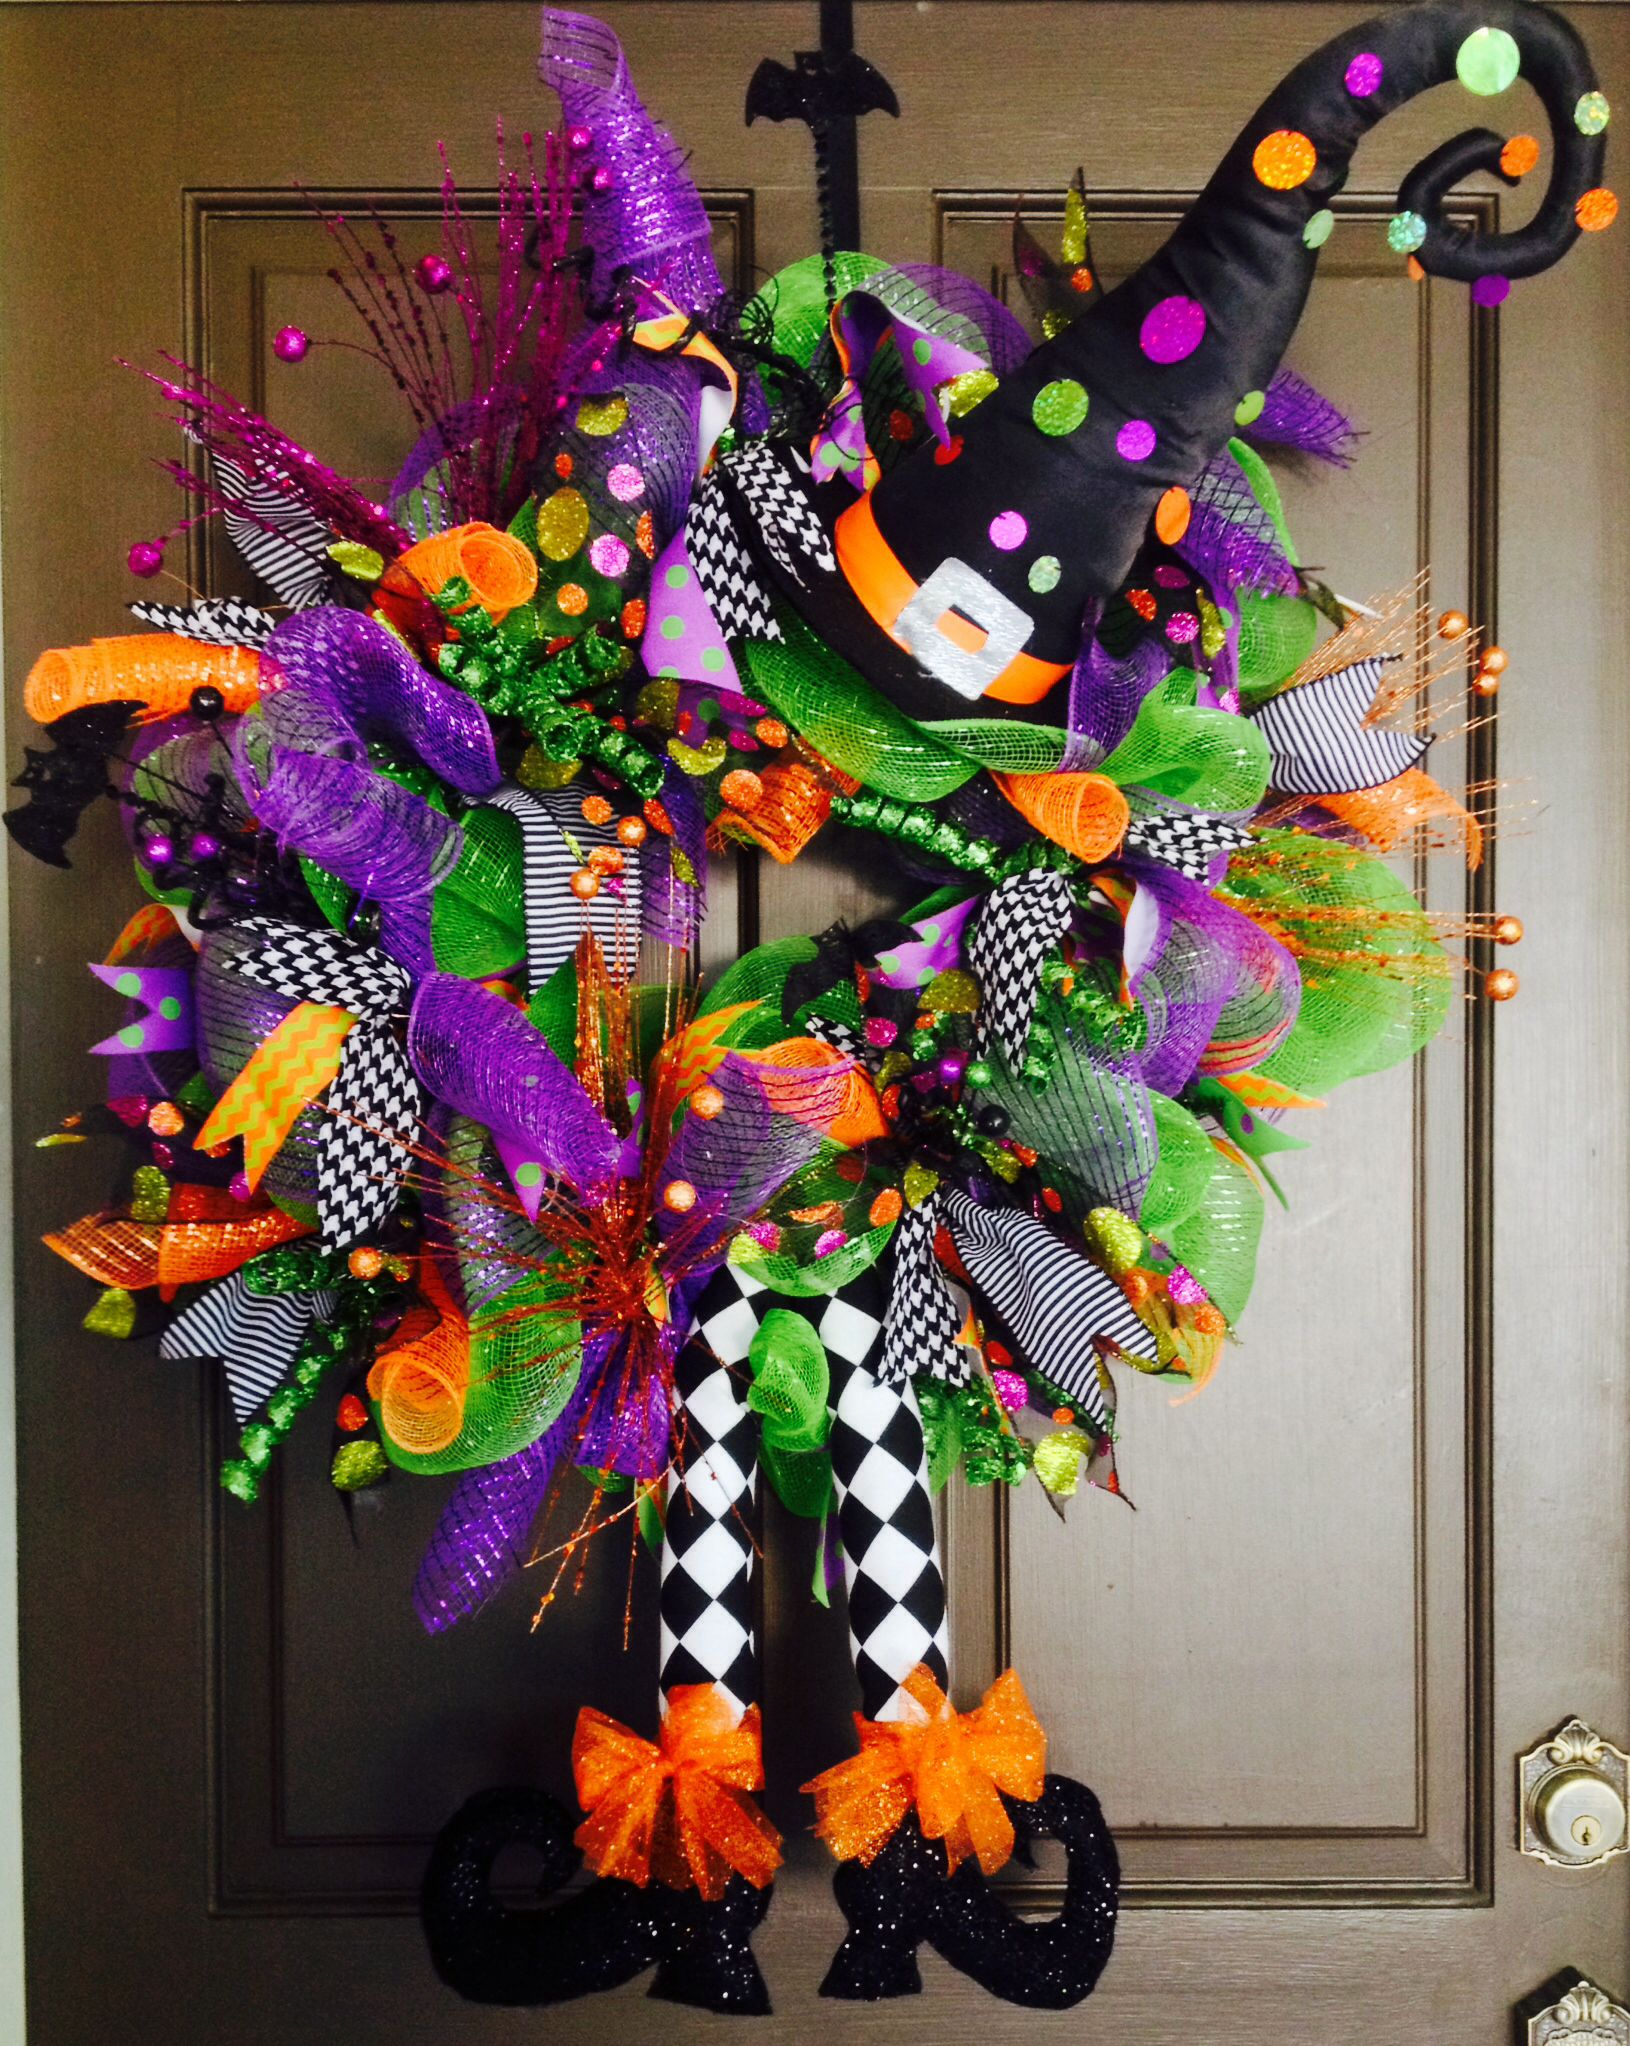 pinjennifer leckey on halloween | pinterest | halloween, wreaths